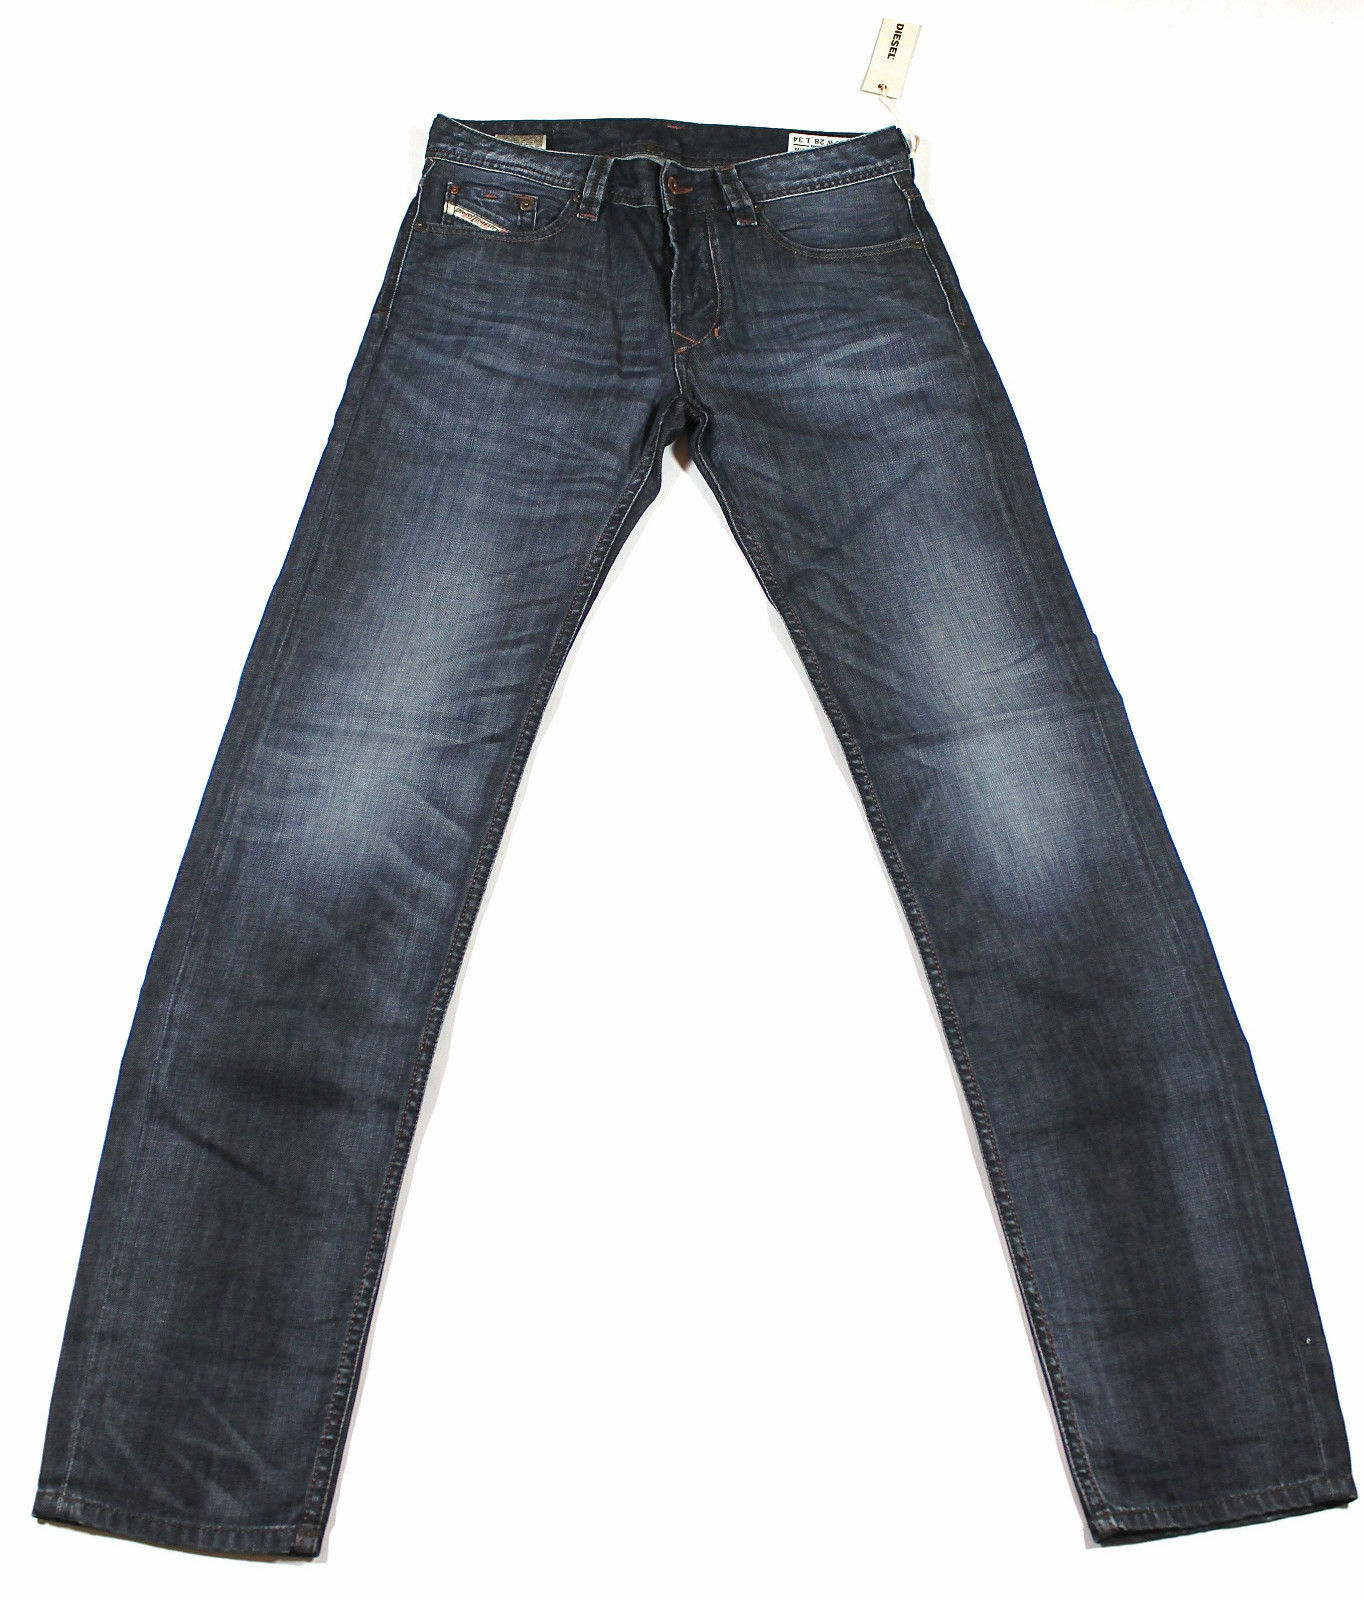 BRAND NEW DIESEL LARKEE-T 886S JEANS 28X34 0886S REGULAR FIT TAPERED LEG